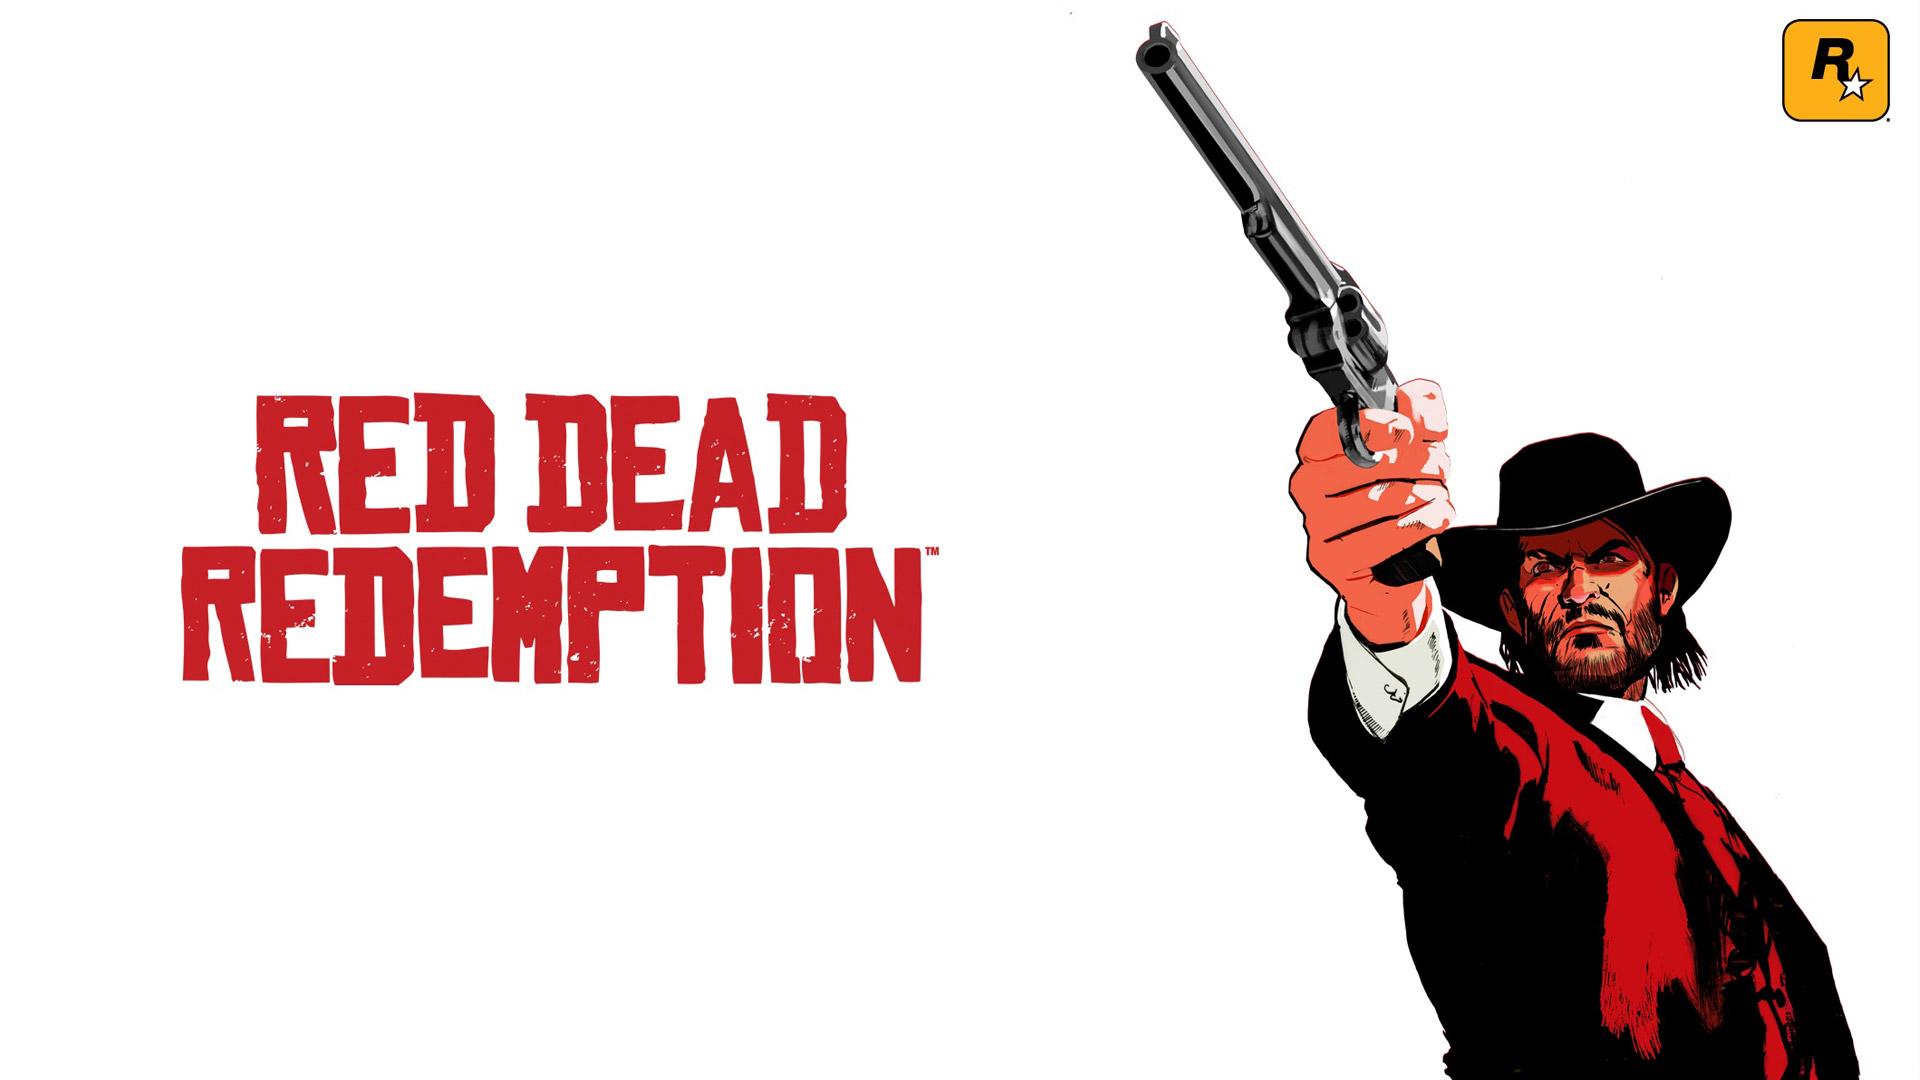 Red Dead Redemption Wallpaper in 1920x1080